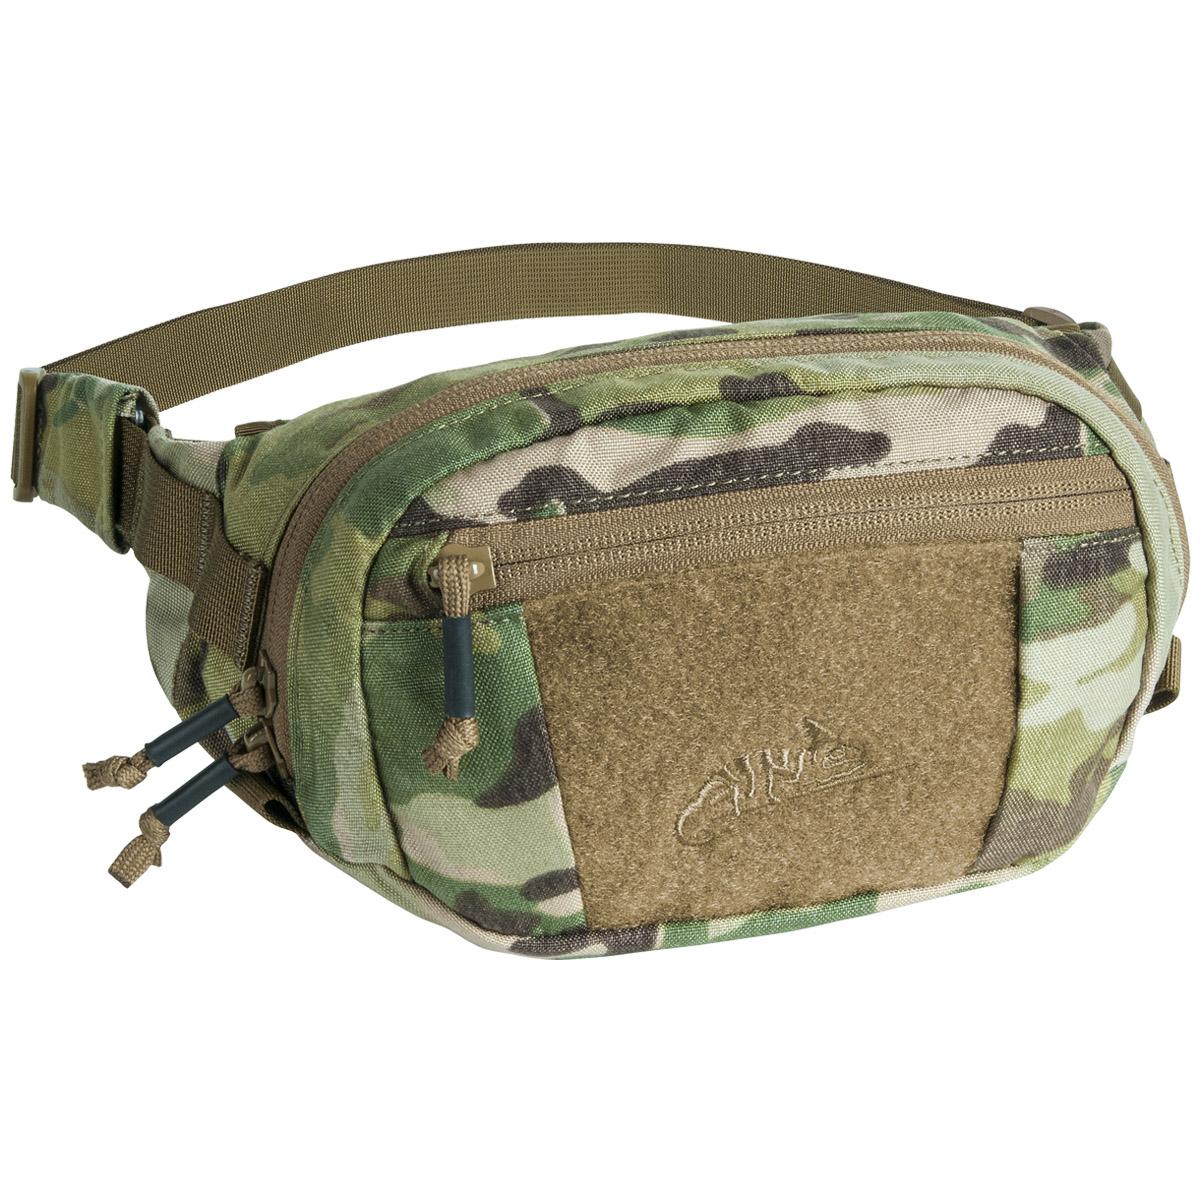 9ab6ef7ee46f Details about Helikon Possum Tactical Waist Pack Military Belt Fanny Bag  Airsoft MultiCam Camo